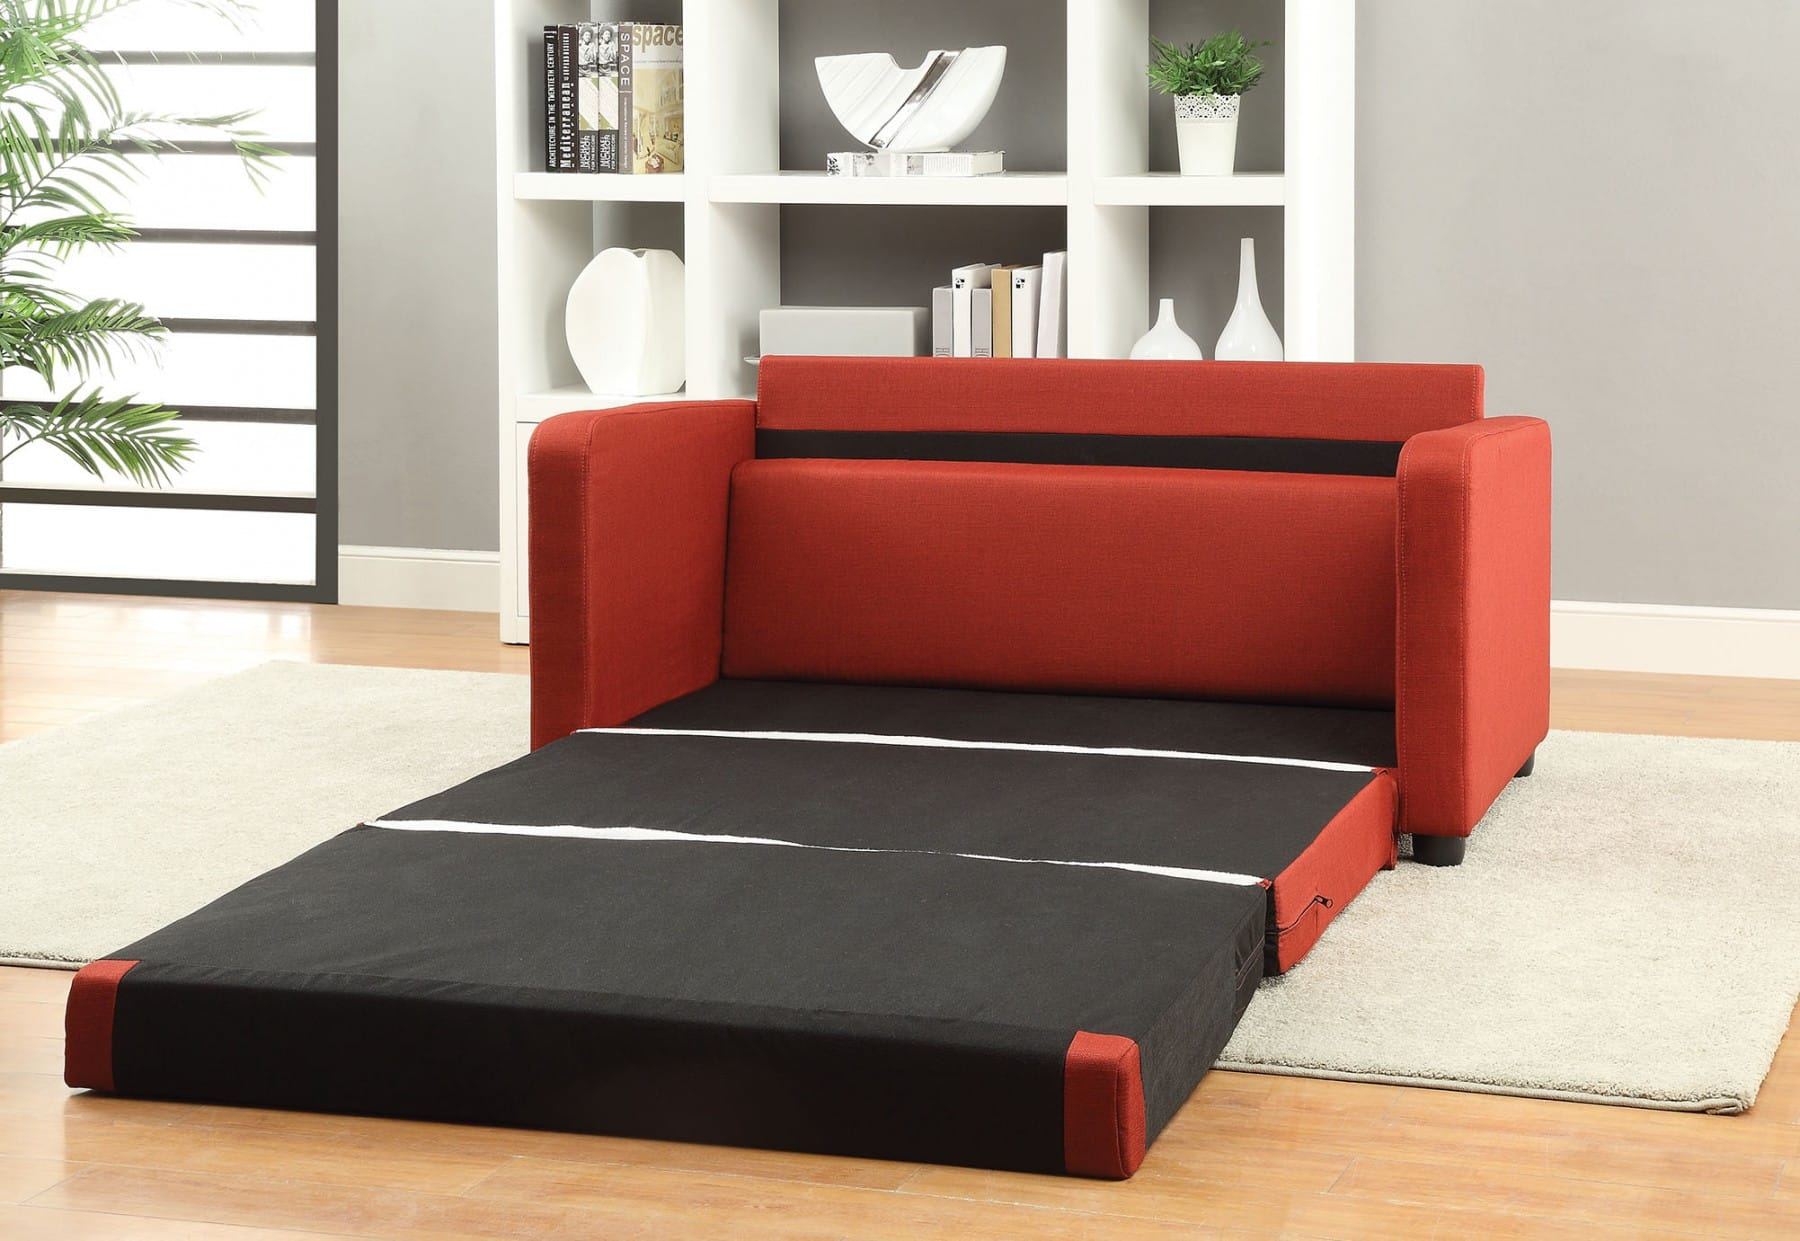 Actona novara sofa bed red refil sofa for Sofa bed jogja